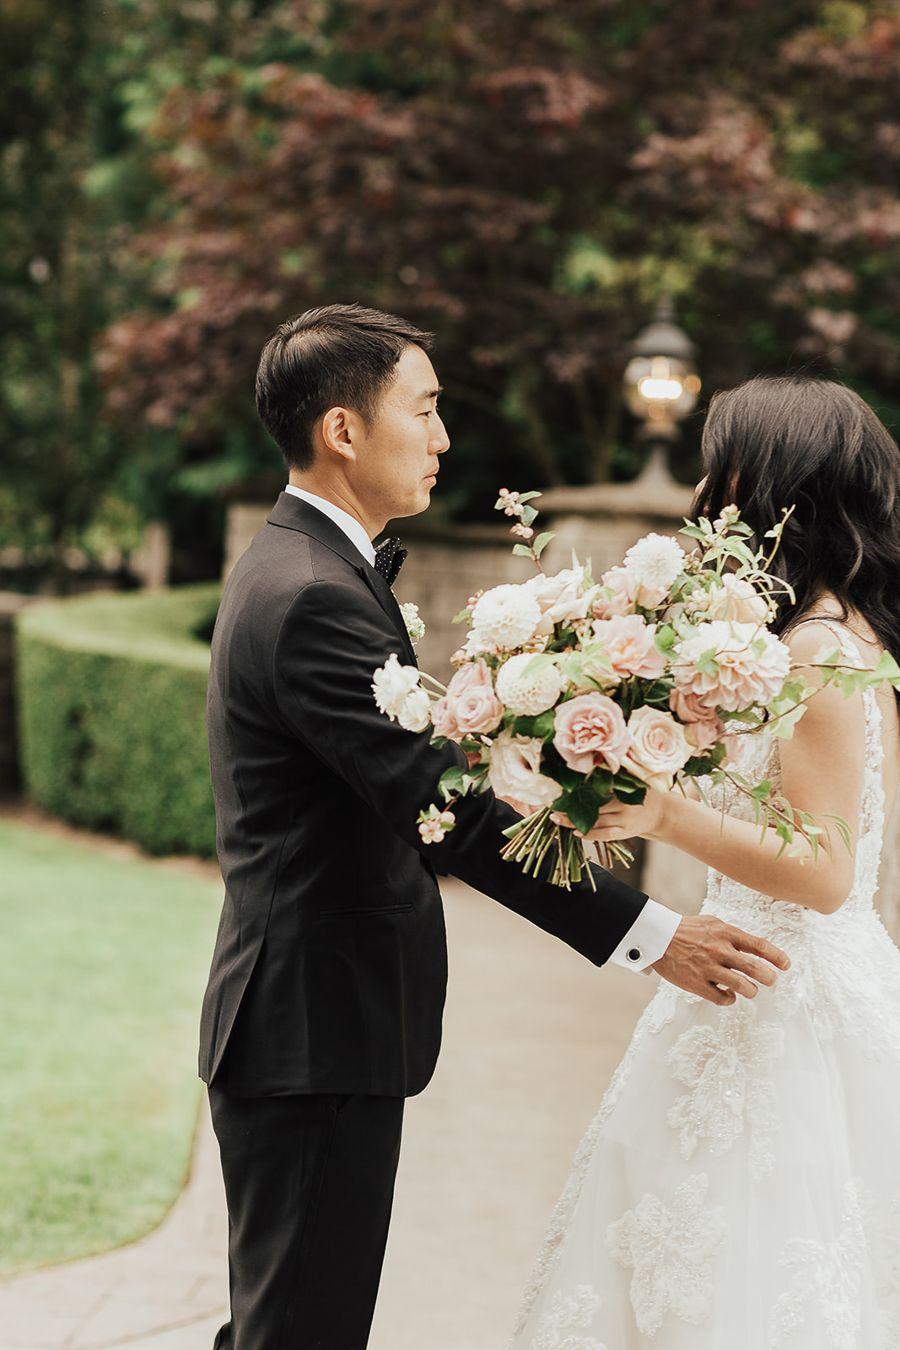 Seattle outdoor wedding, First Look photos, groom cries, Seattle fashion blogger Just A Tina Bit wedding